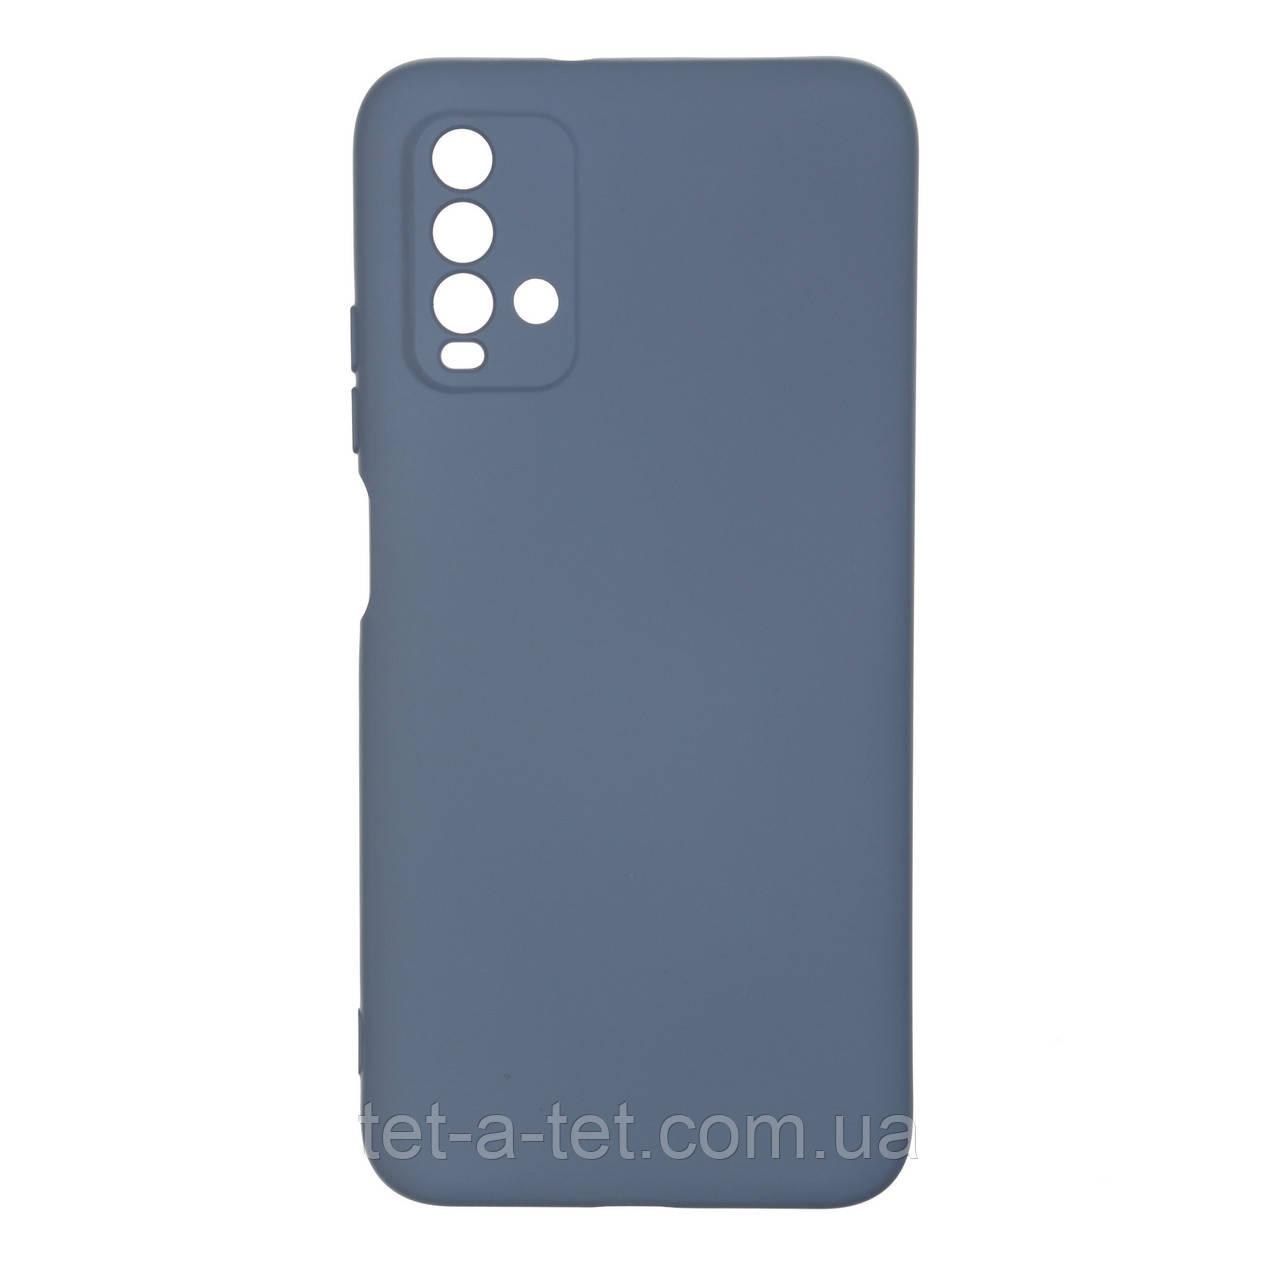 Чохол силіконовий ArmorStandart ICON Case for Xiaomi Redmi 9T Blue